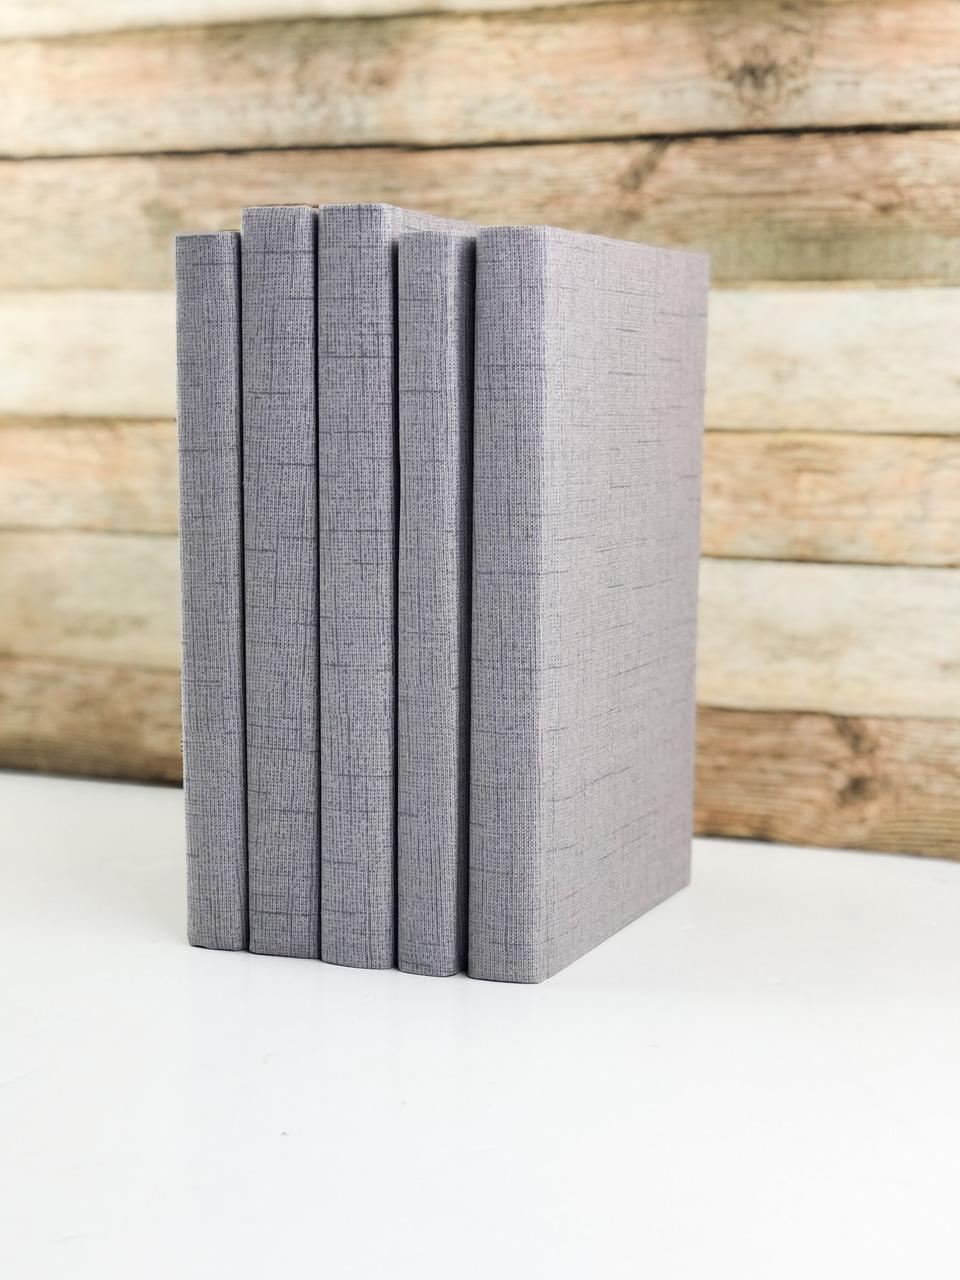 Set of 3 Decorative Books- Textured Gray